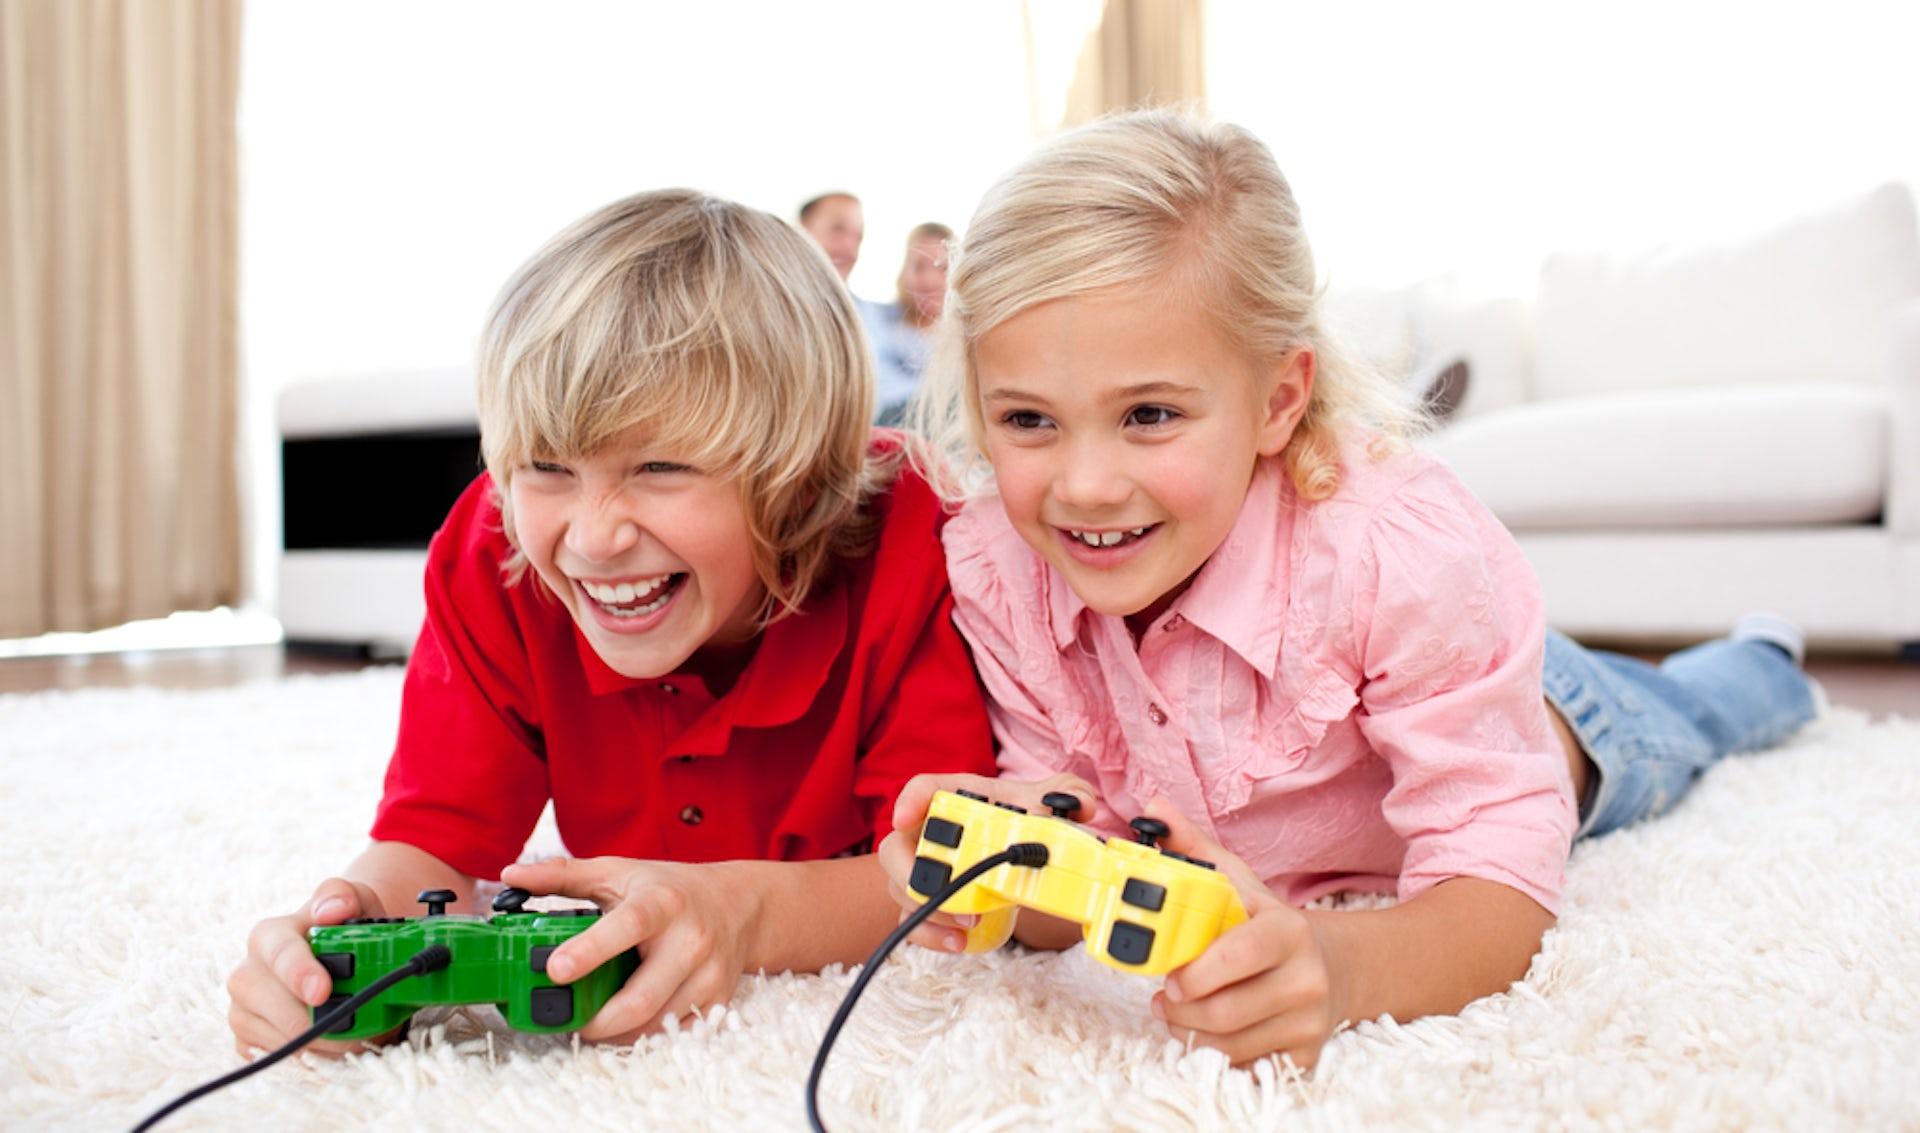 Sex games for kids online in Brisbane